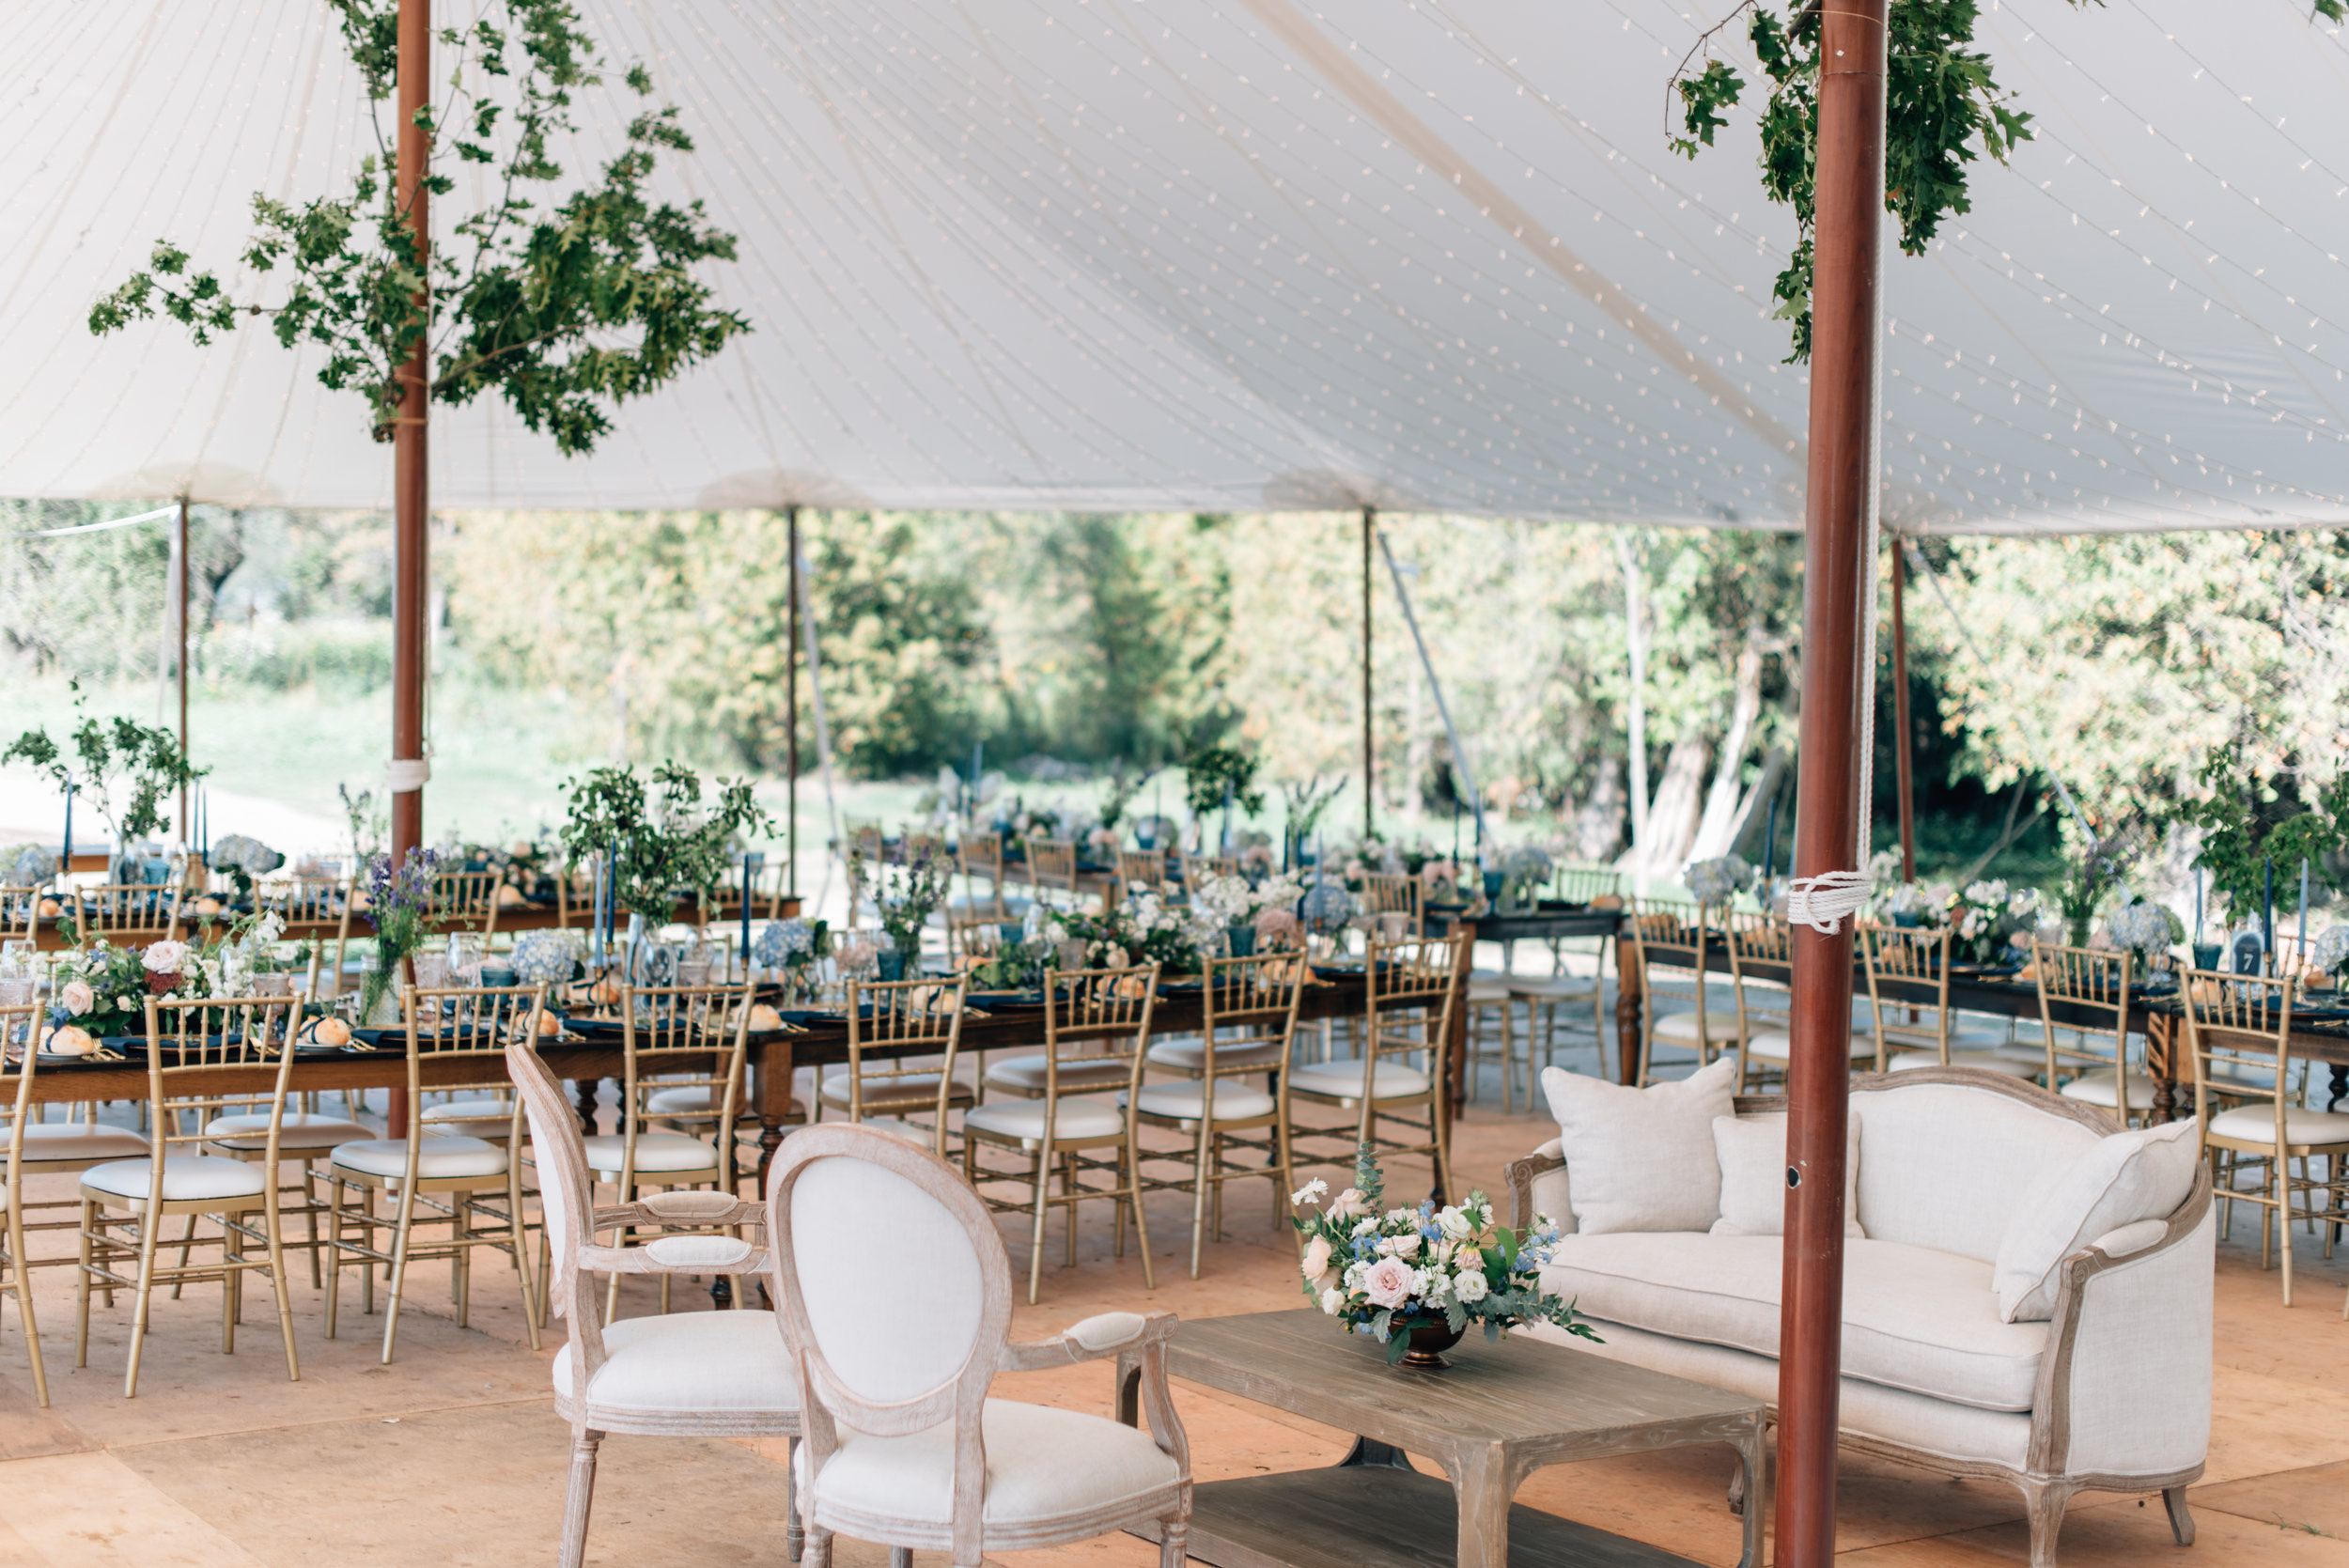 sept-23-wedding-details-lustre-events-sara-wilde-photography-0086.jpg